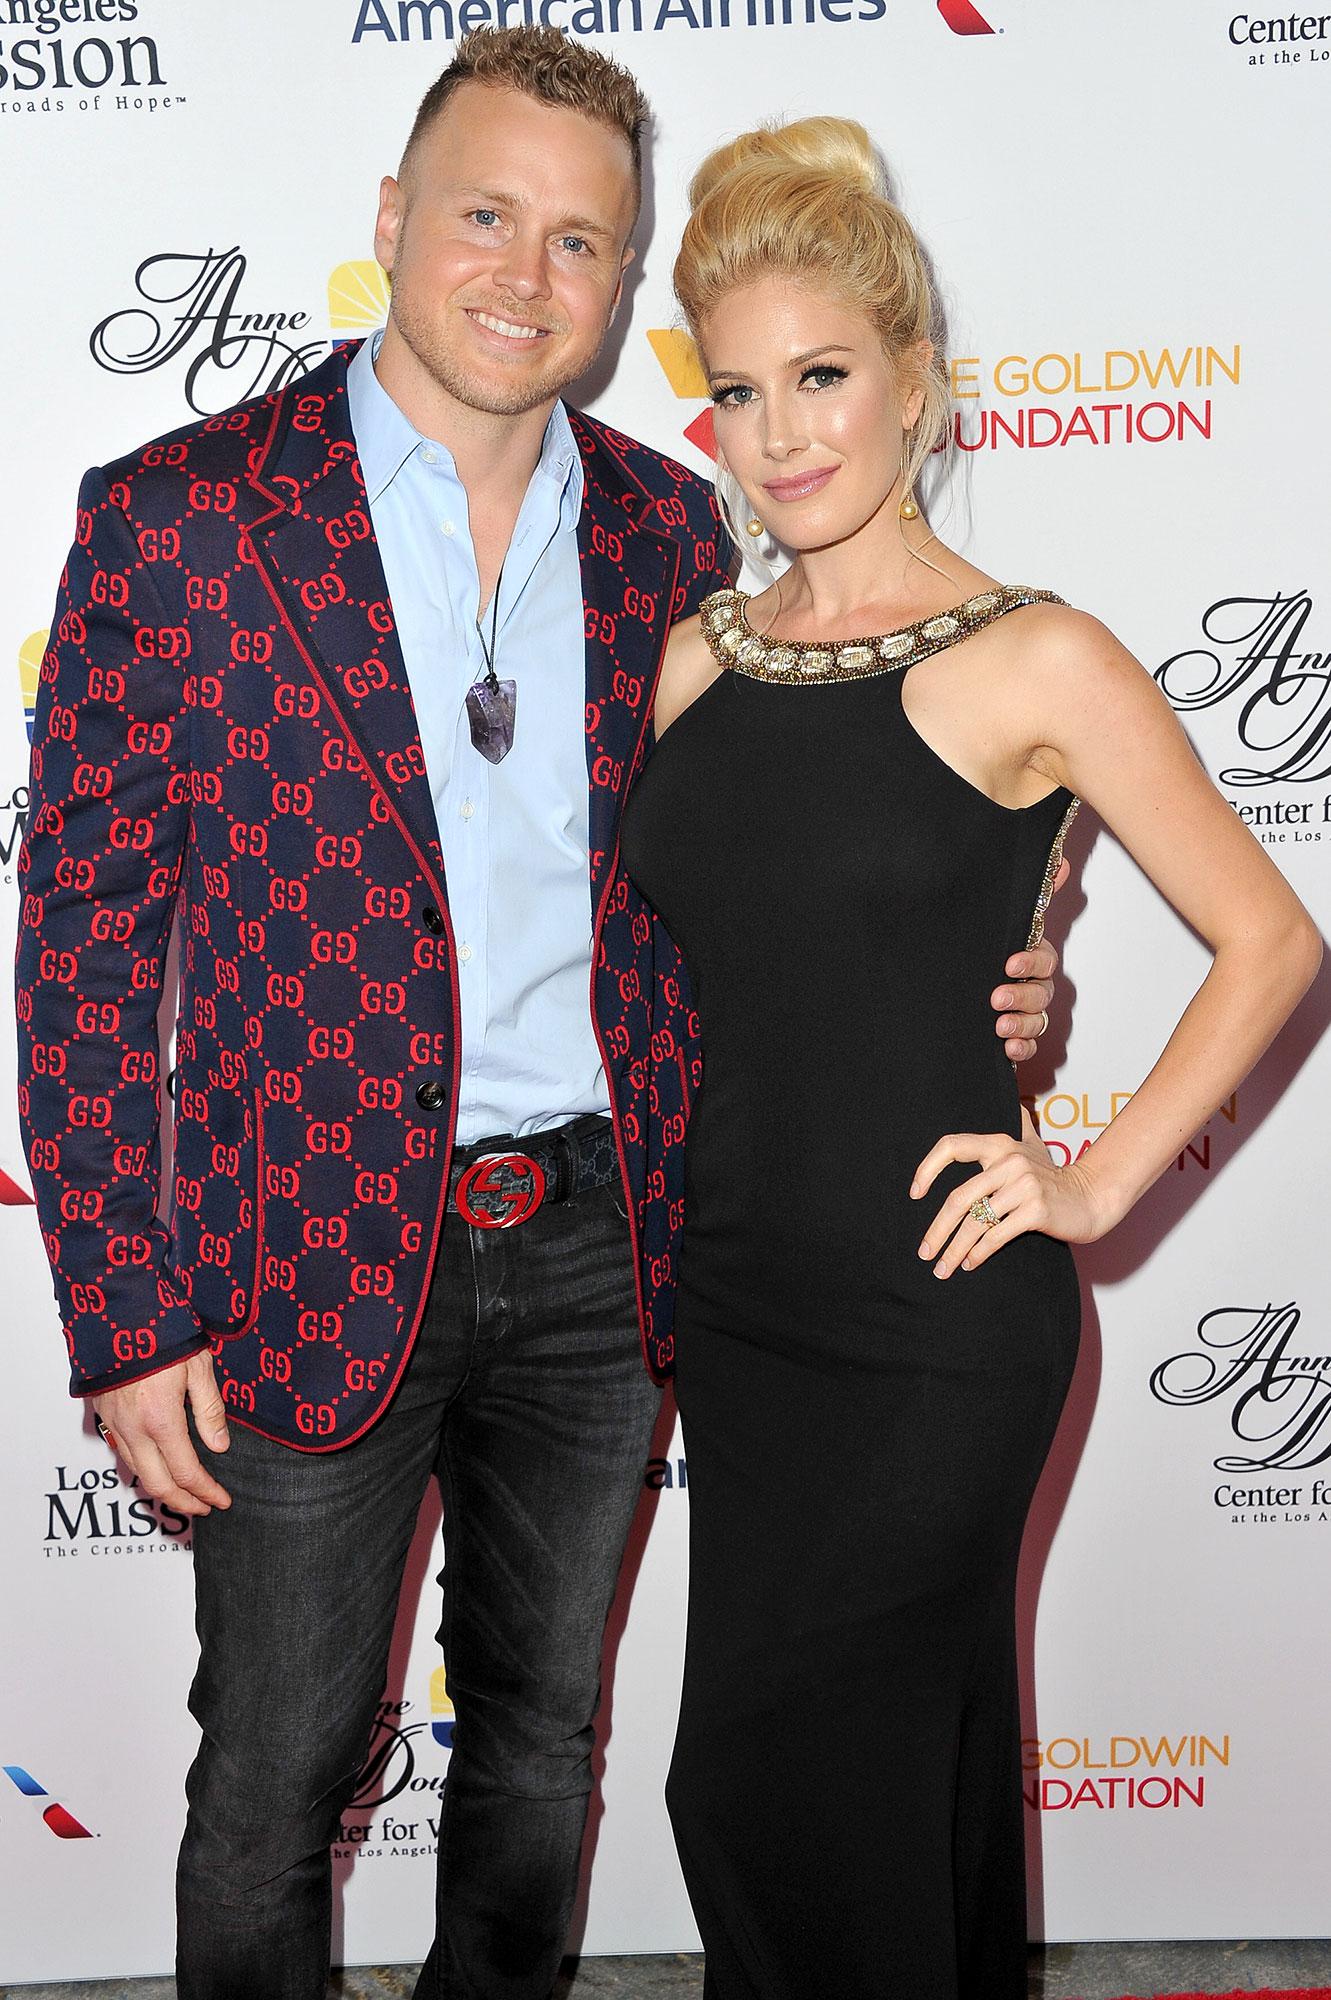 Spenser Pratt Heidi Pratt Comfort Mom - Spenser Pratt and Heidi Pratt attend the Los Angeles Mission Legacy of Vision gala at The Beverly Hilton Hotel on October 25, 2018 in Beverly Hills, California.